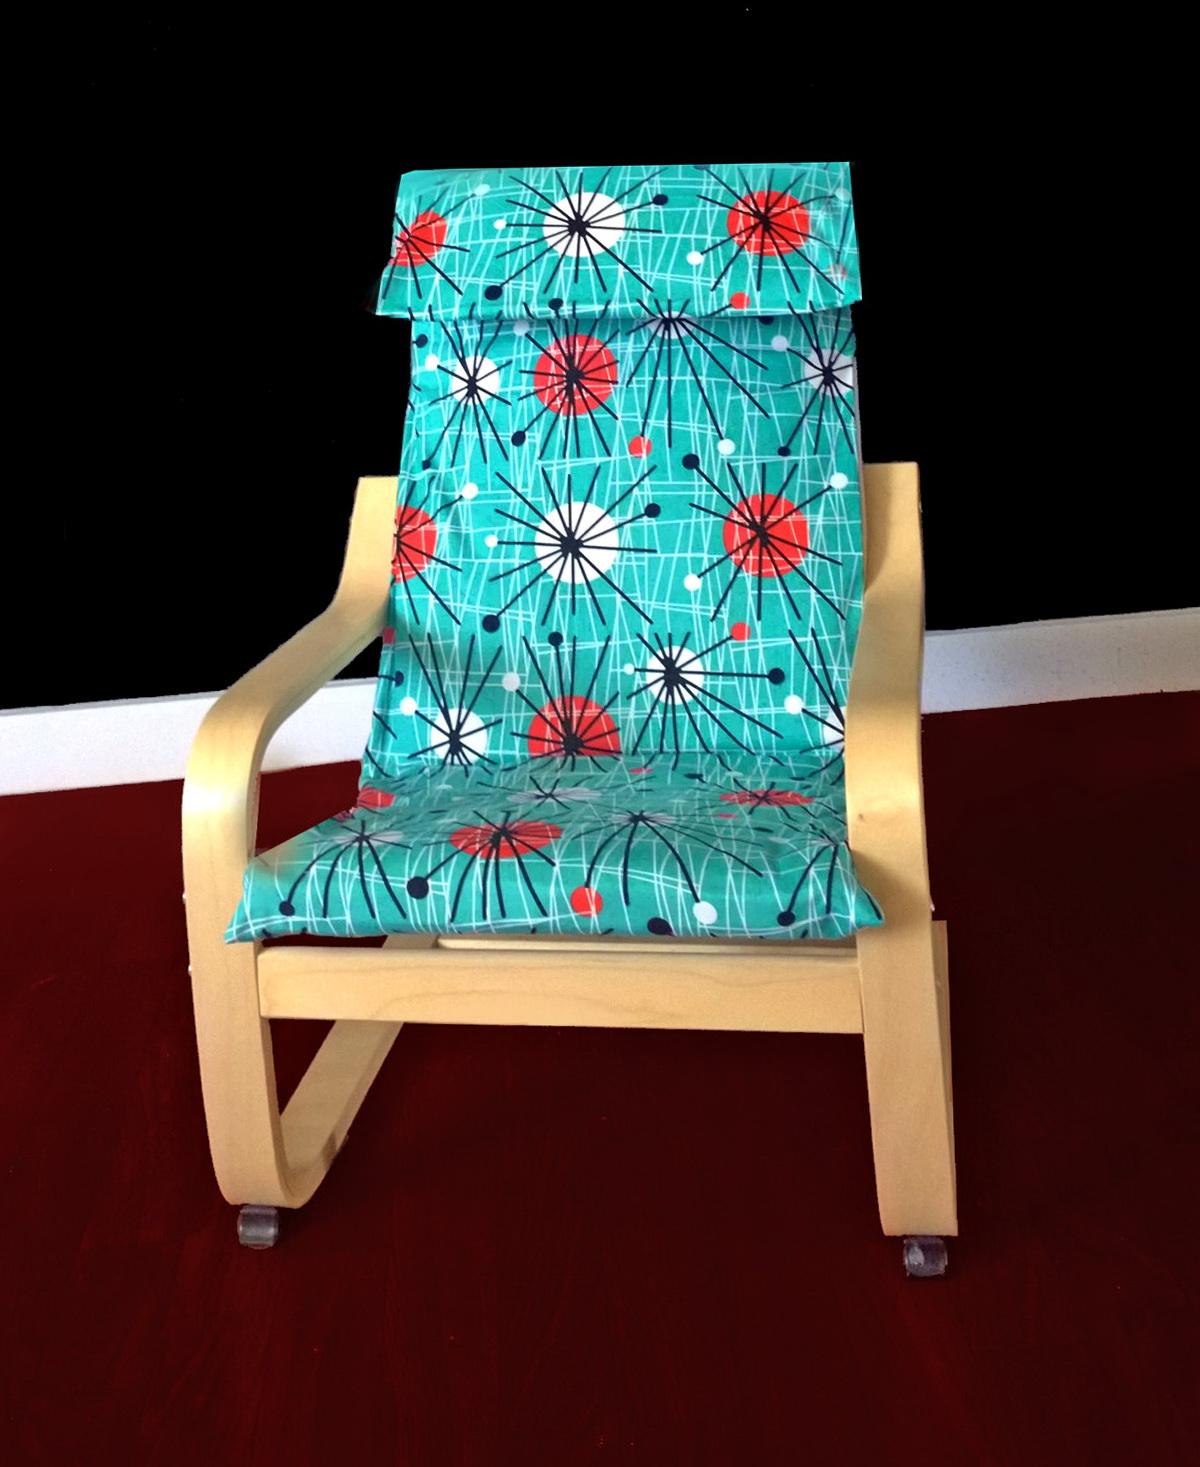 ikea poang chair covers uk sheepskin recliners cushion home design ideas